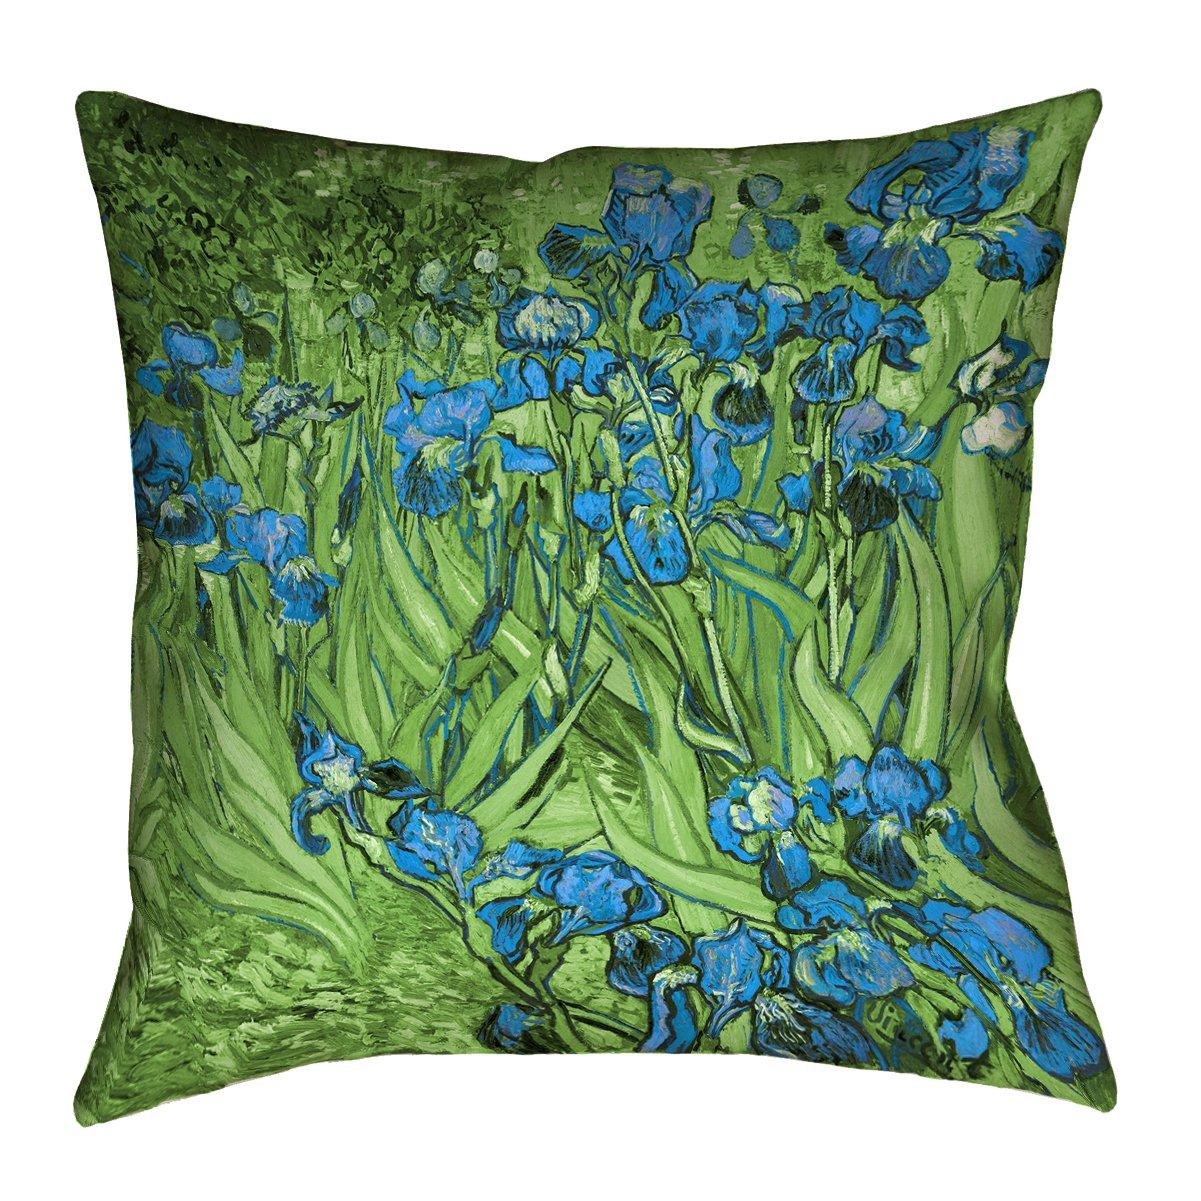 KESS InHouse Famenxt Romantic Yellow Heart Twin Comforter 68 X 88